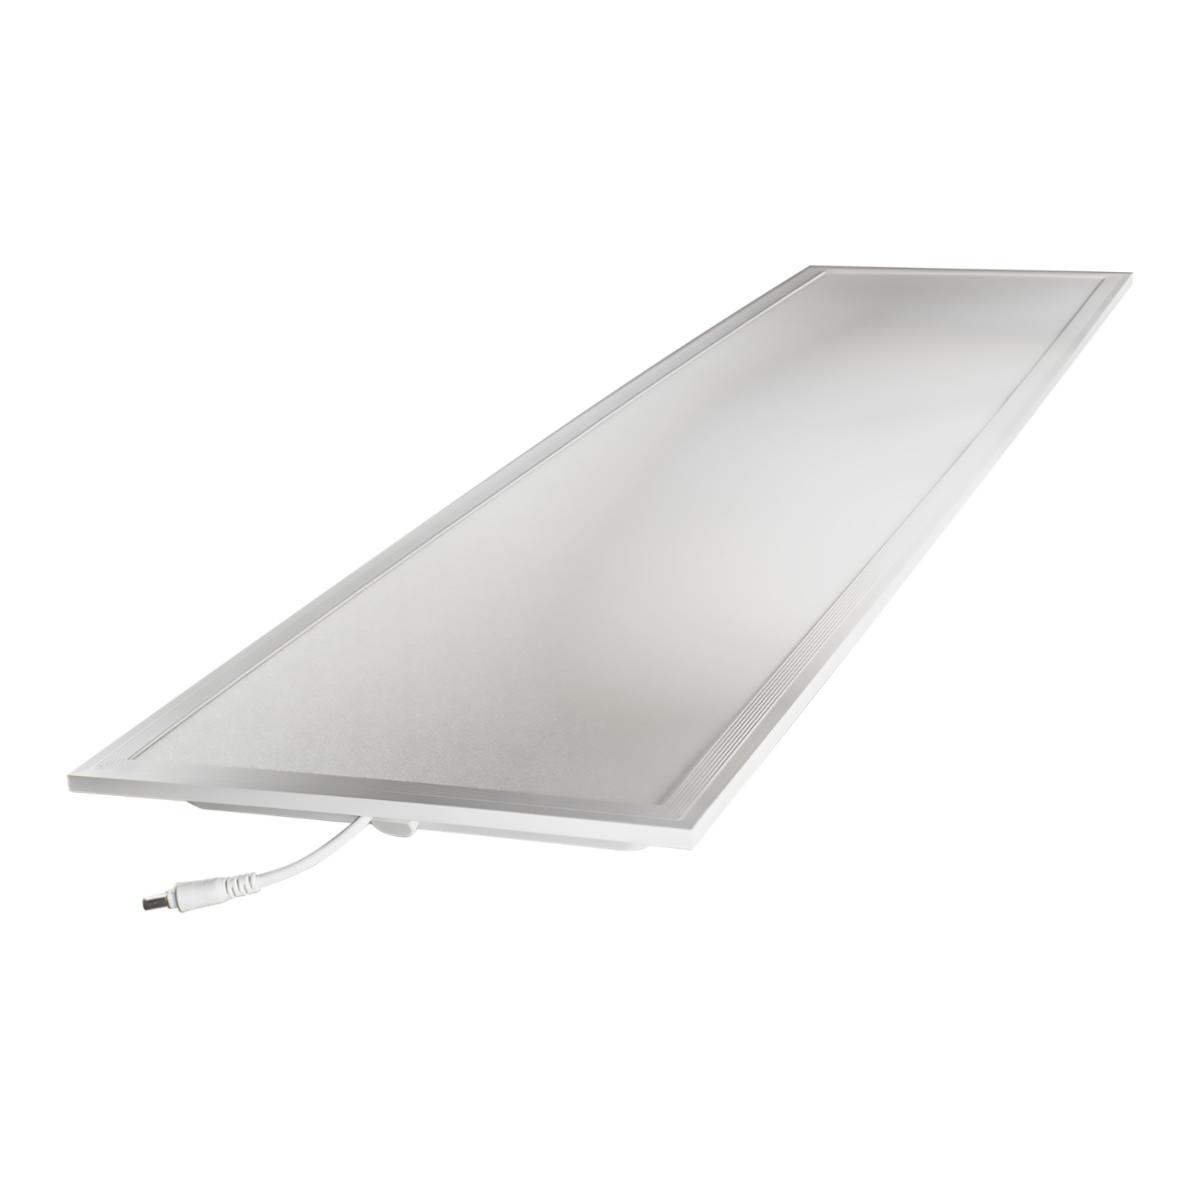 Noxion LED Paneeli Delta Pro V2.0 Xitanium DALI 30W 30x120cm 6500K 4110lm UGR <19   Dali Himmennettävä - Päivänvalo Valkoinen - Korvaa 2x36W